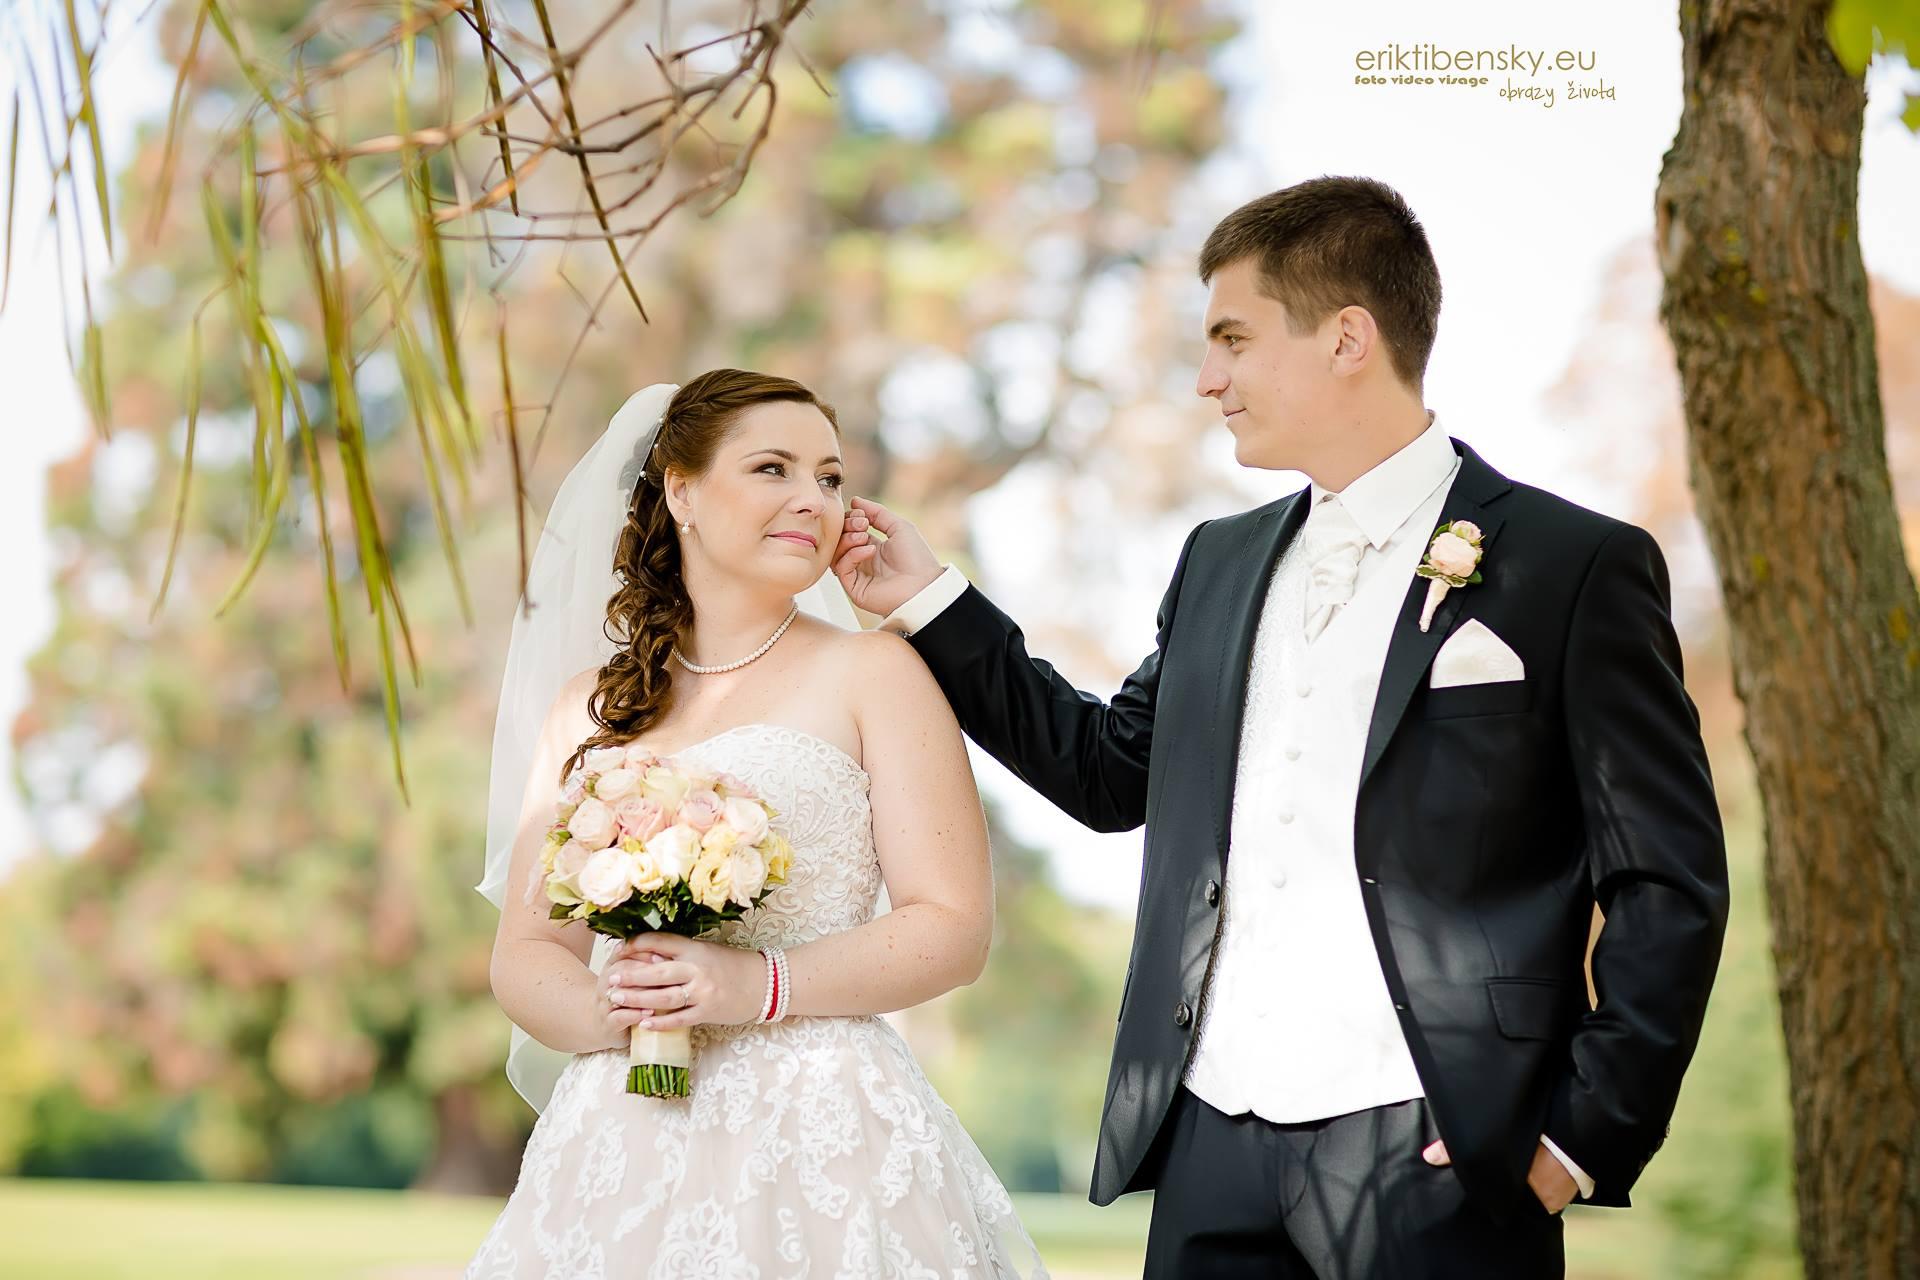 eriktibensky-eu-svadobny-fotograf-wedding-photographer-3082